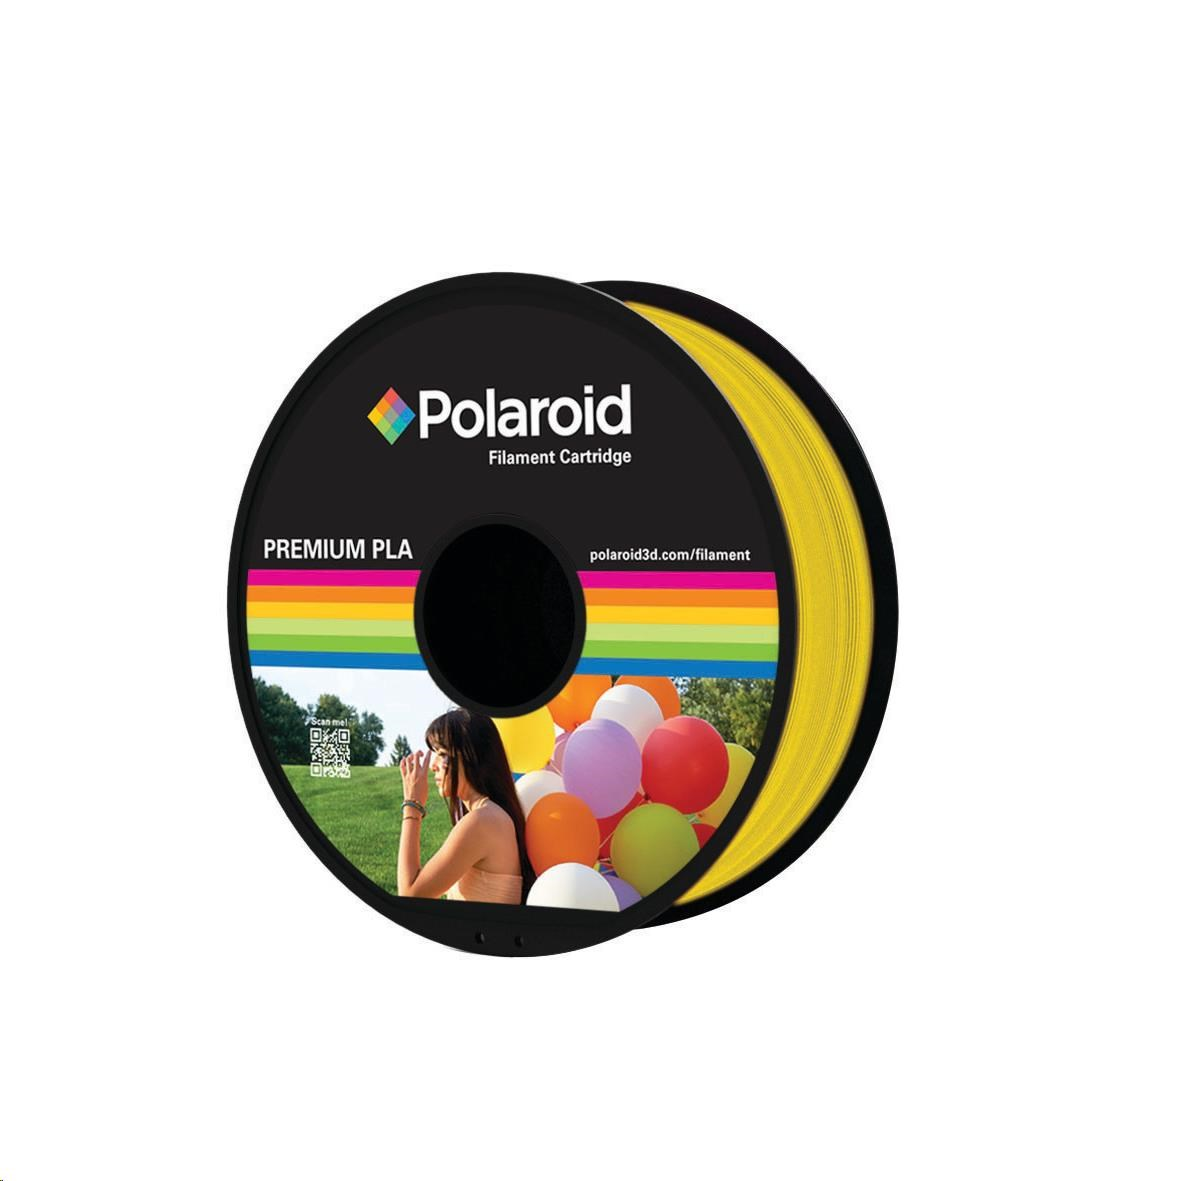 Polaroid 1kg Universal Premium PLA filament, 1.75mm/1kg - Yellow